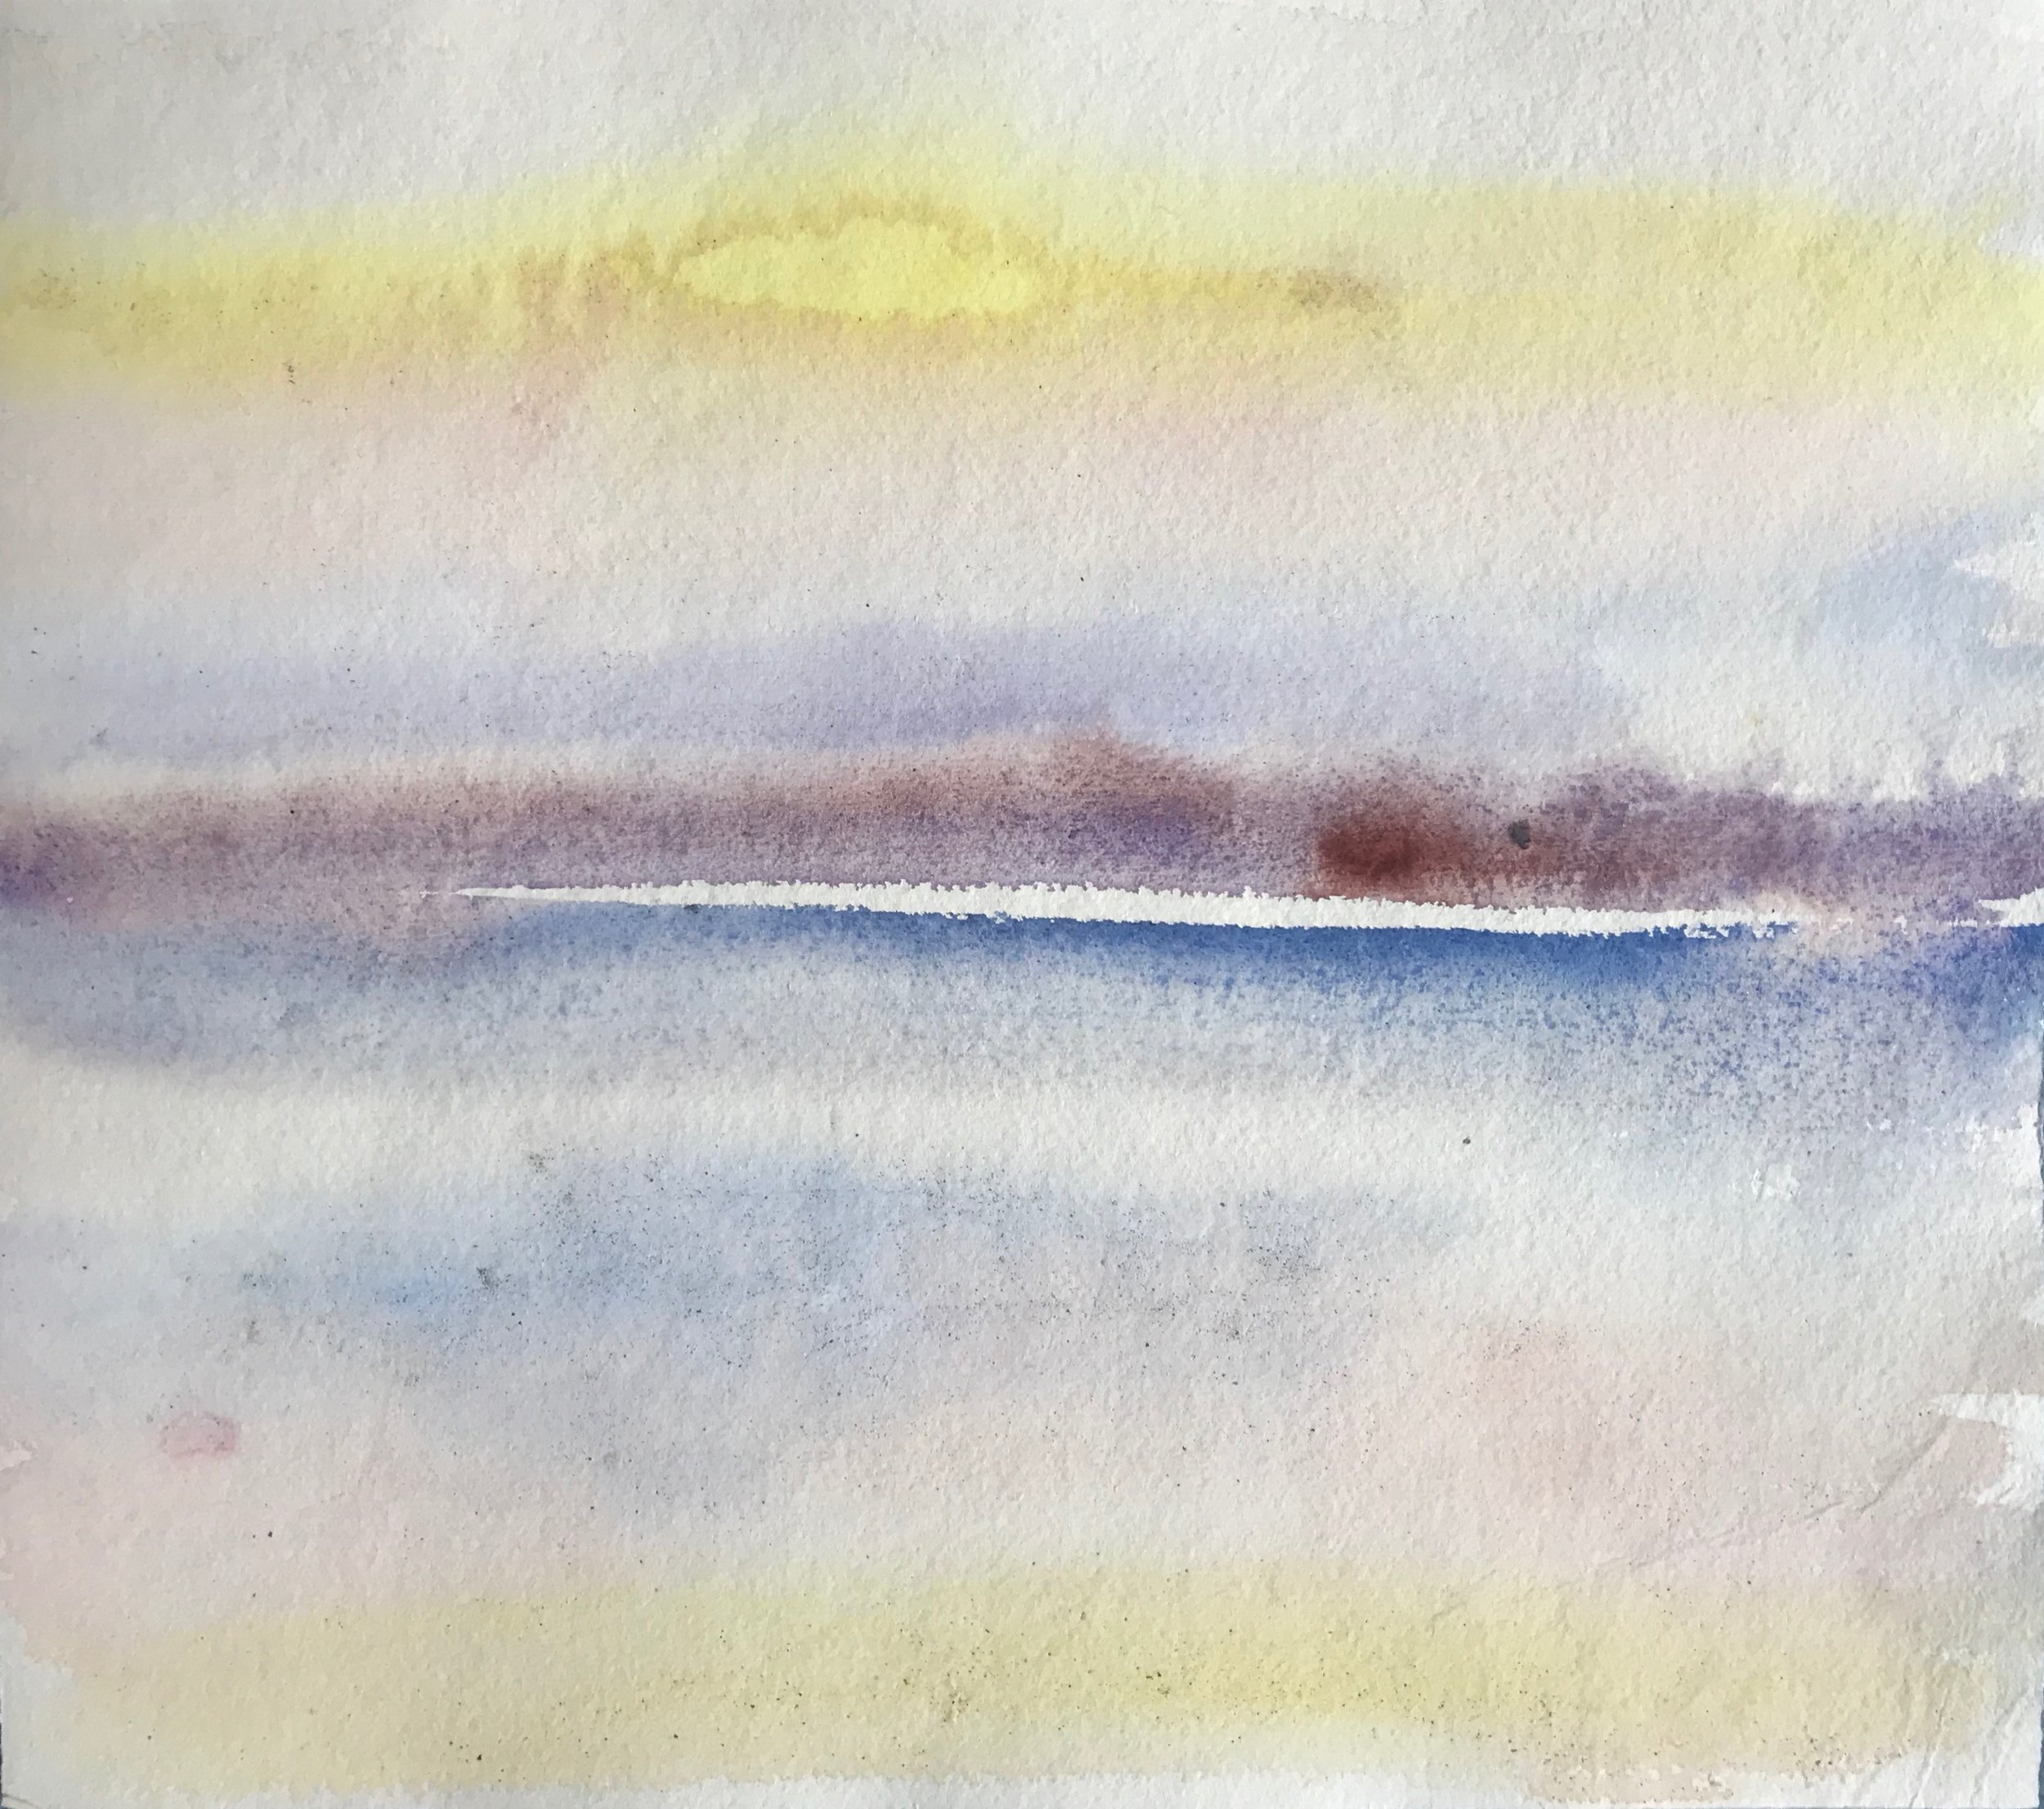 Sunrise study 4 (Ganges),30x34cm.jpeg